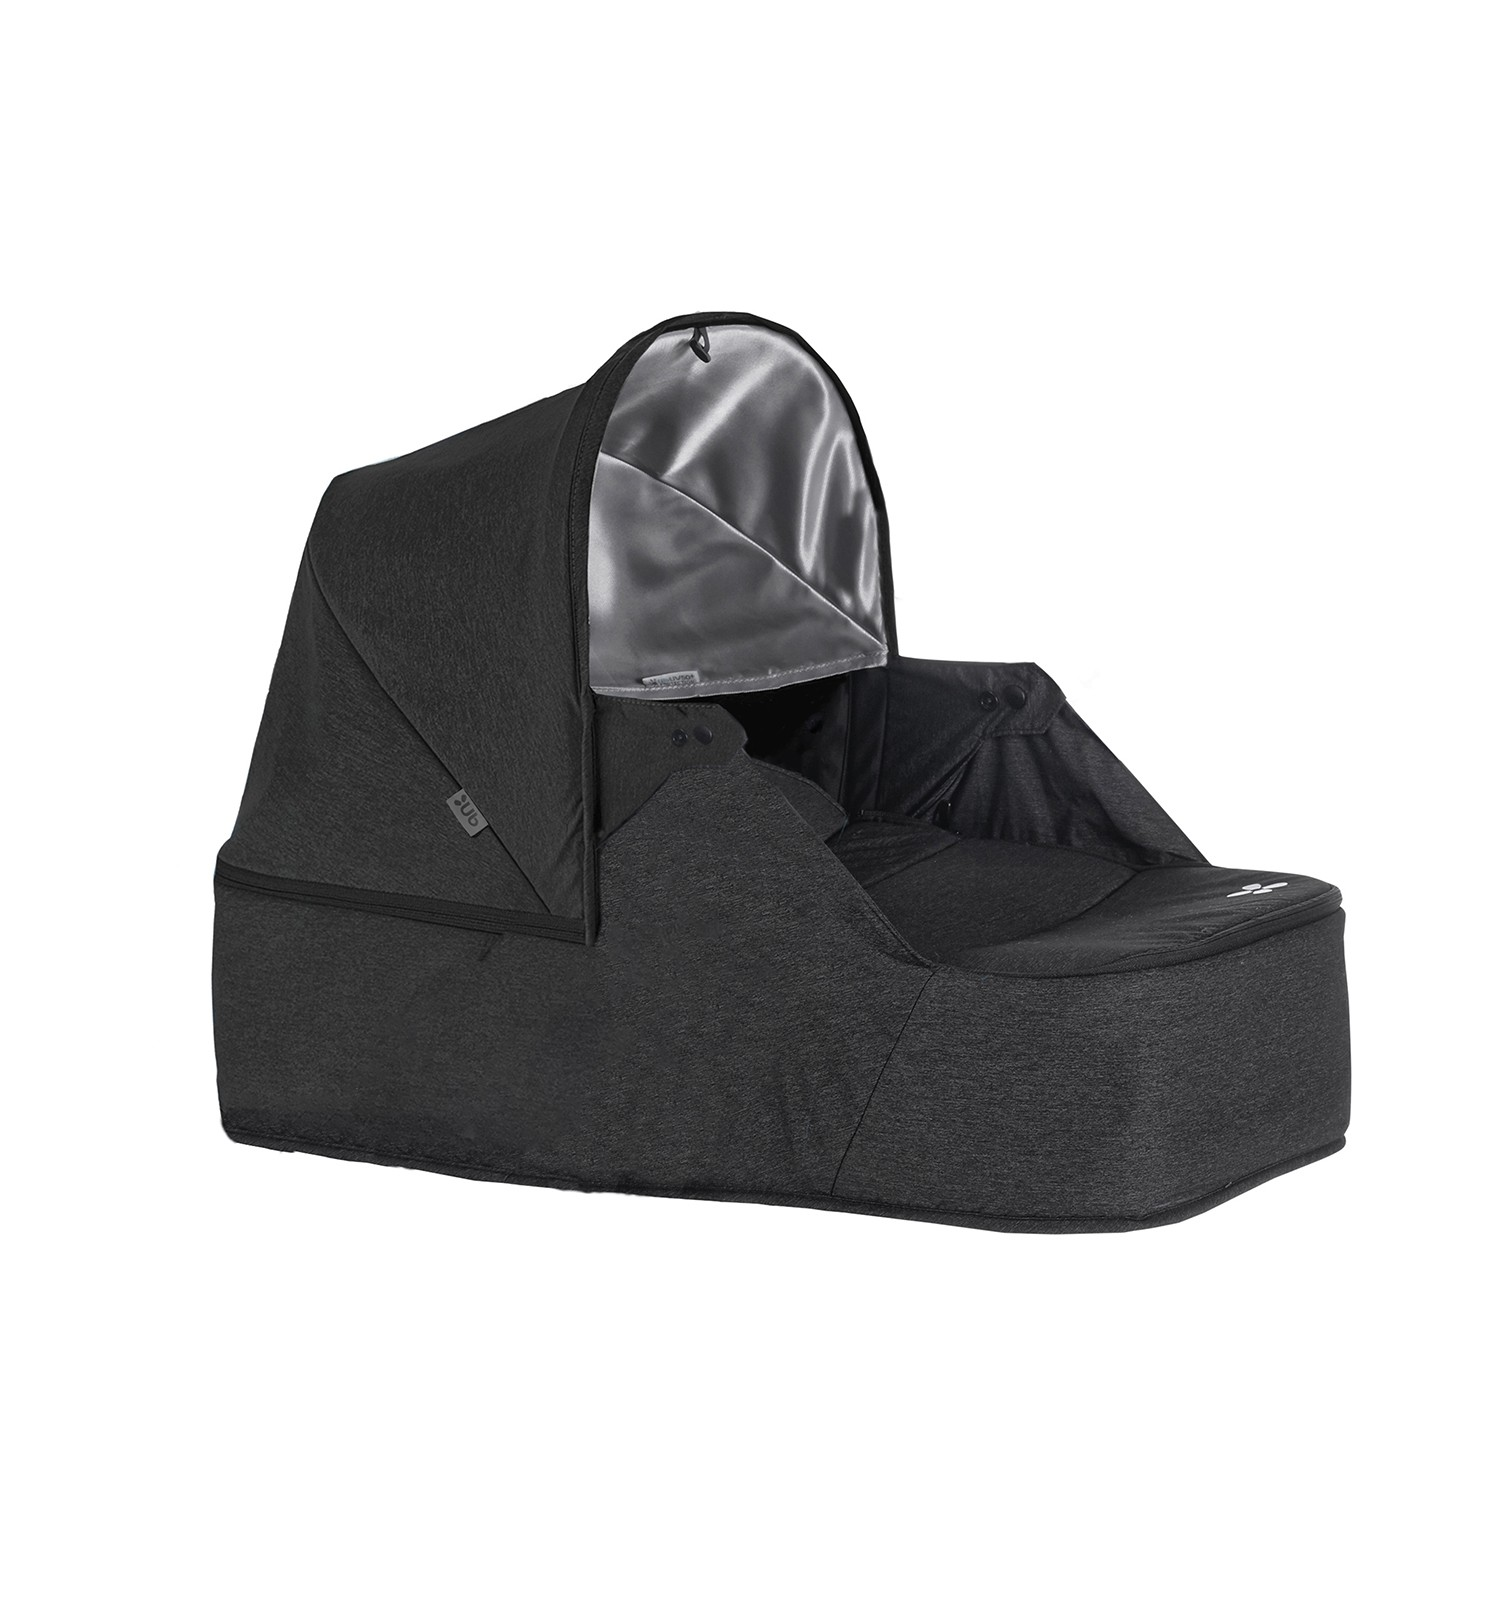 Люлька для коляски UPPAbaby Minu черная аксессуар для колясок uppababy адаптер макси кози minu